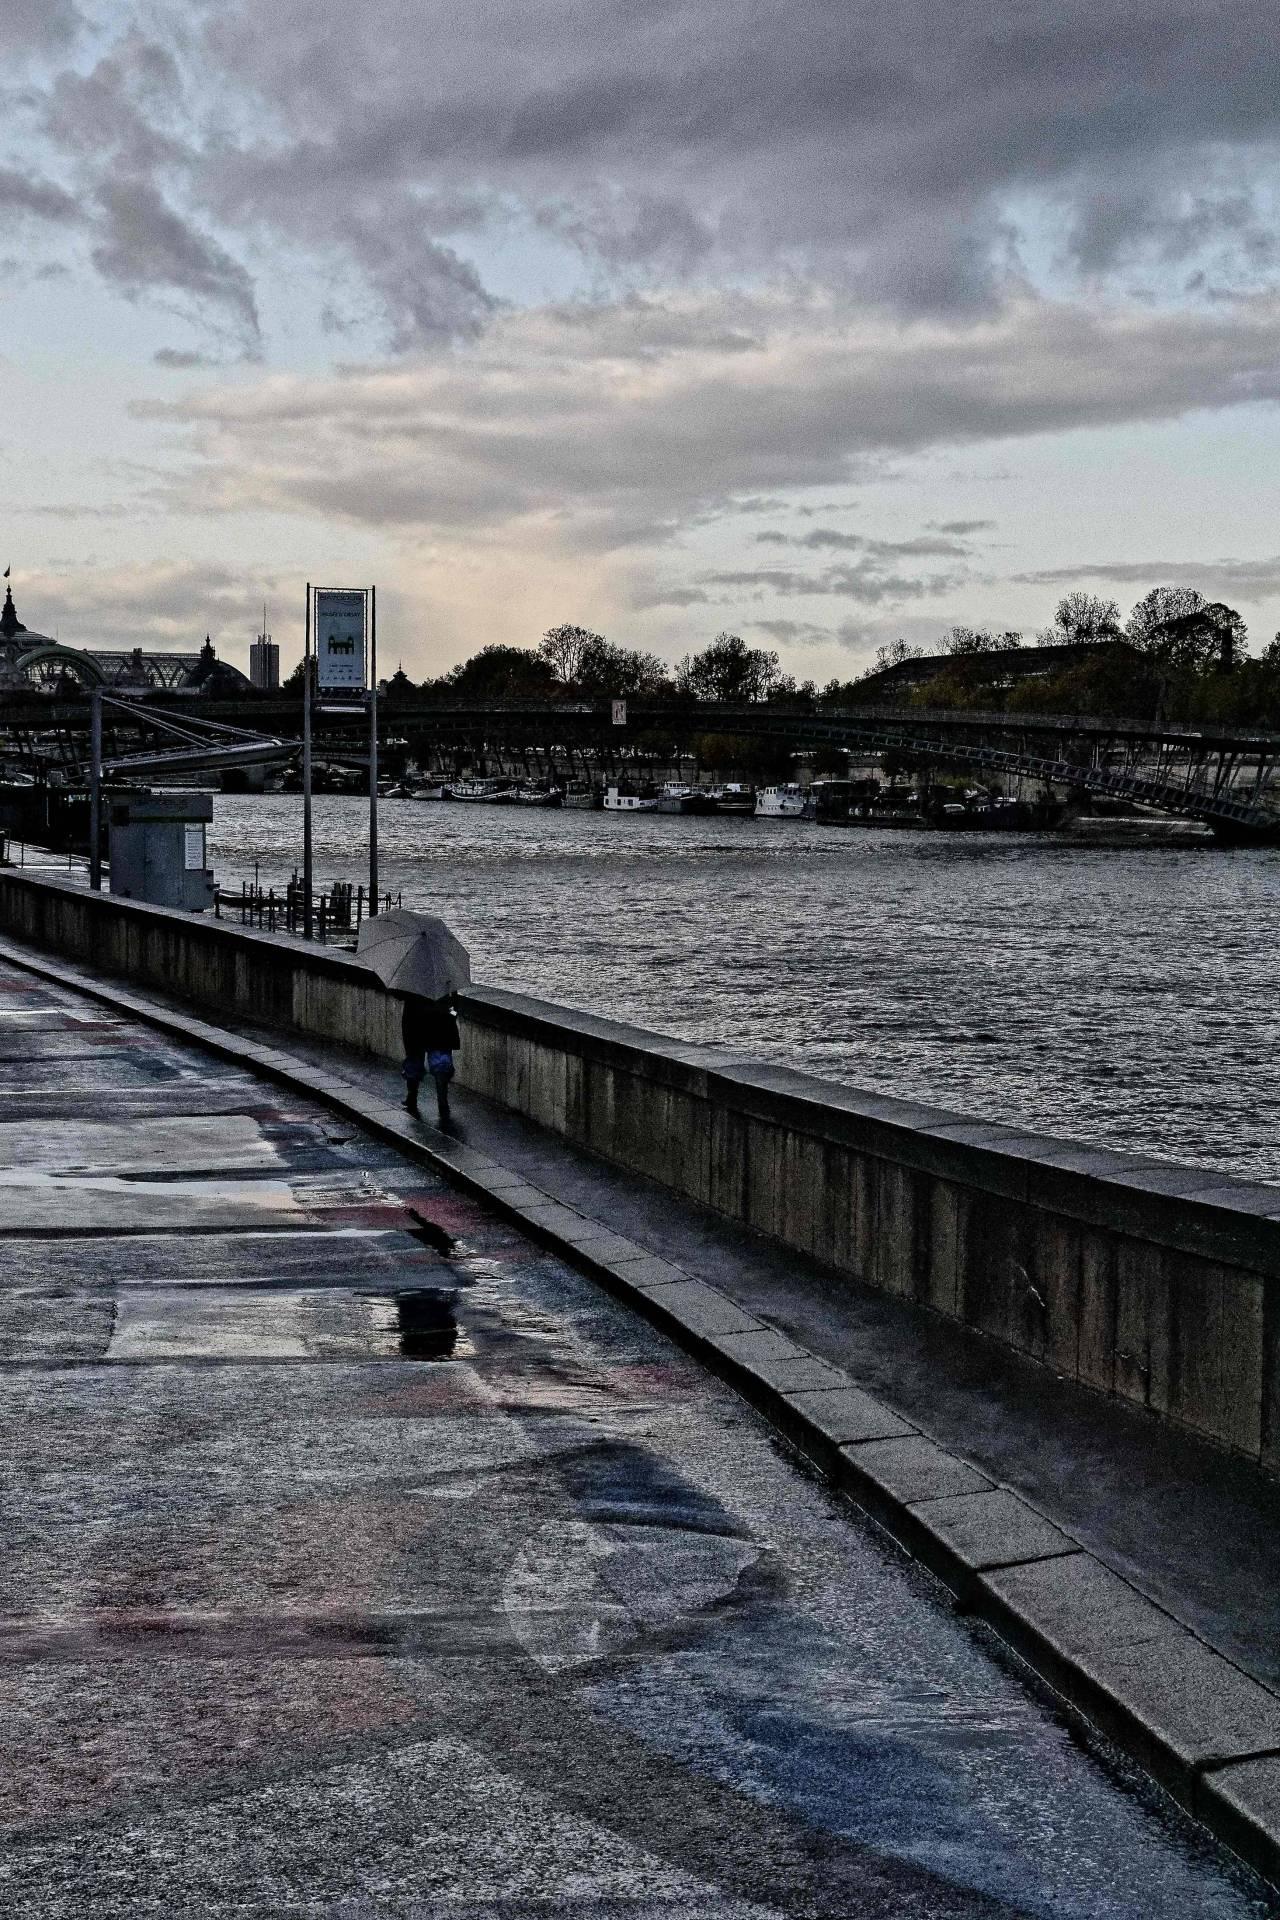 #rainy#rainy weather#rain#umbrella#reflection#seineriver#river#Paris#france #photographer paris photoshoot photo photography photographers on tumblr france #photo#photography#photographer#Street Photography #photographers on tumblr #autumm